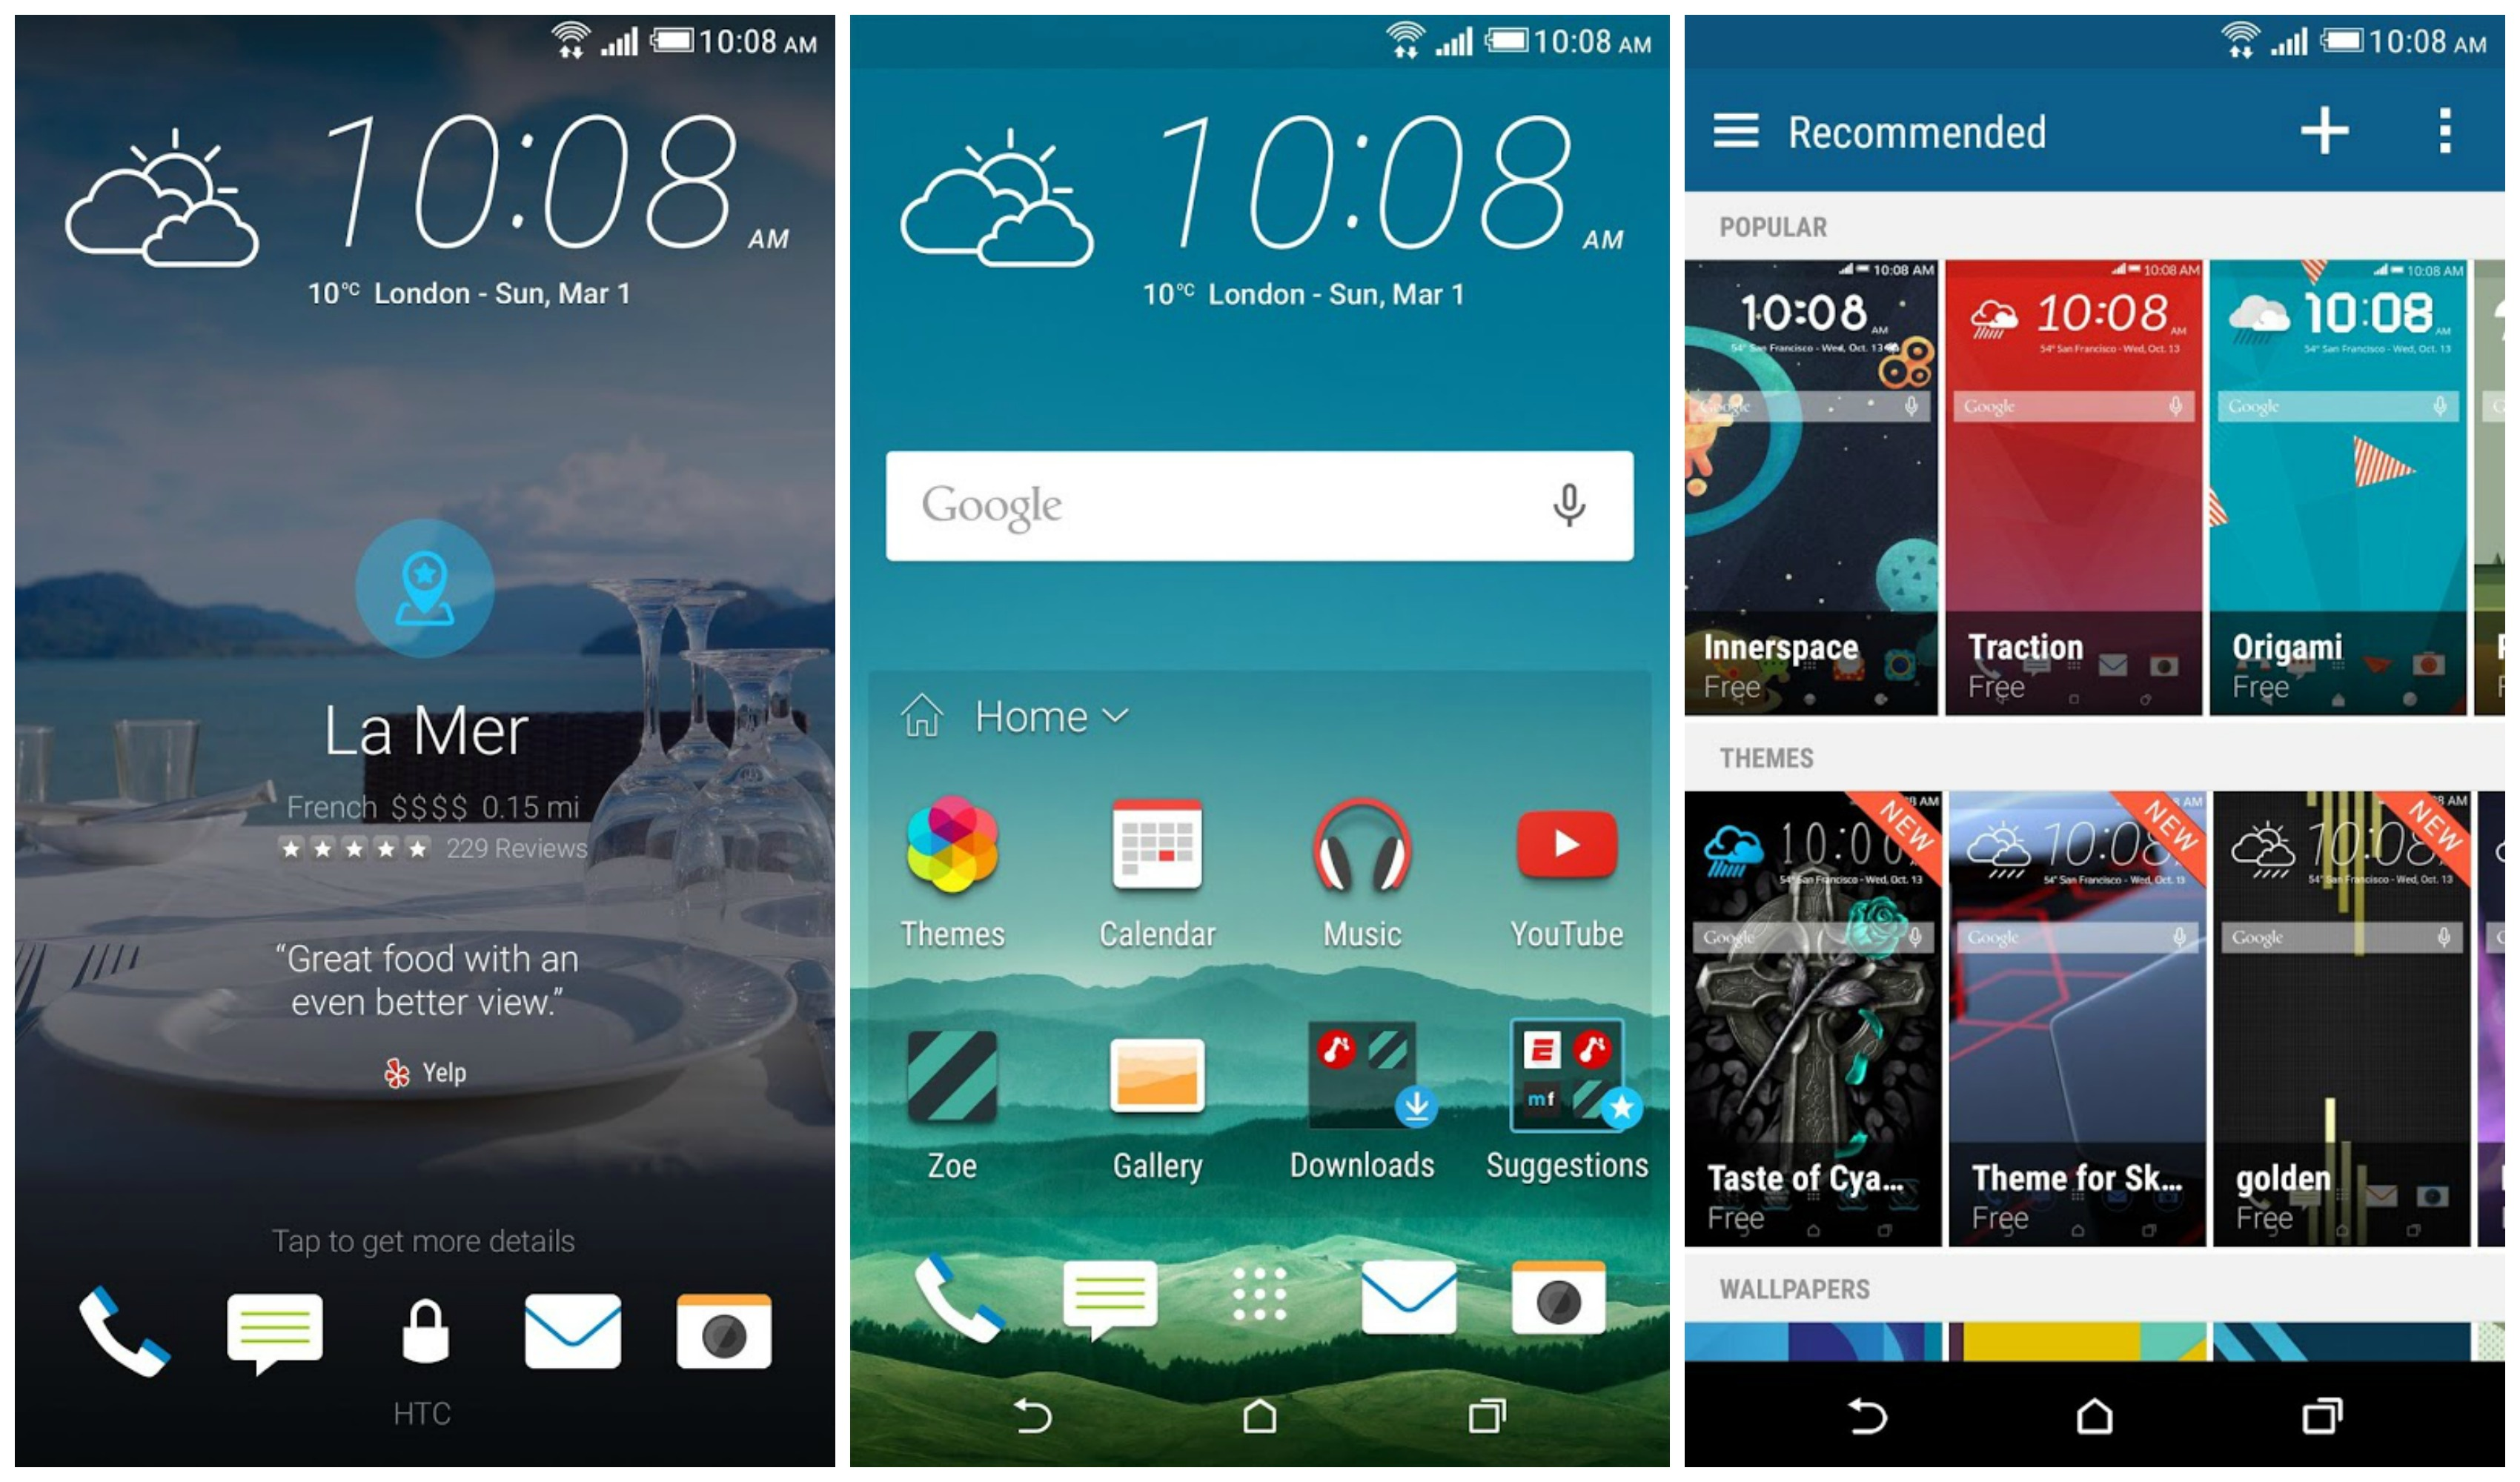 HTC Sense Home brings Sense 7 goodies to One M8/M7